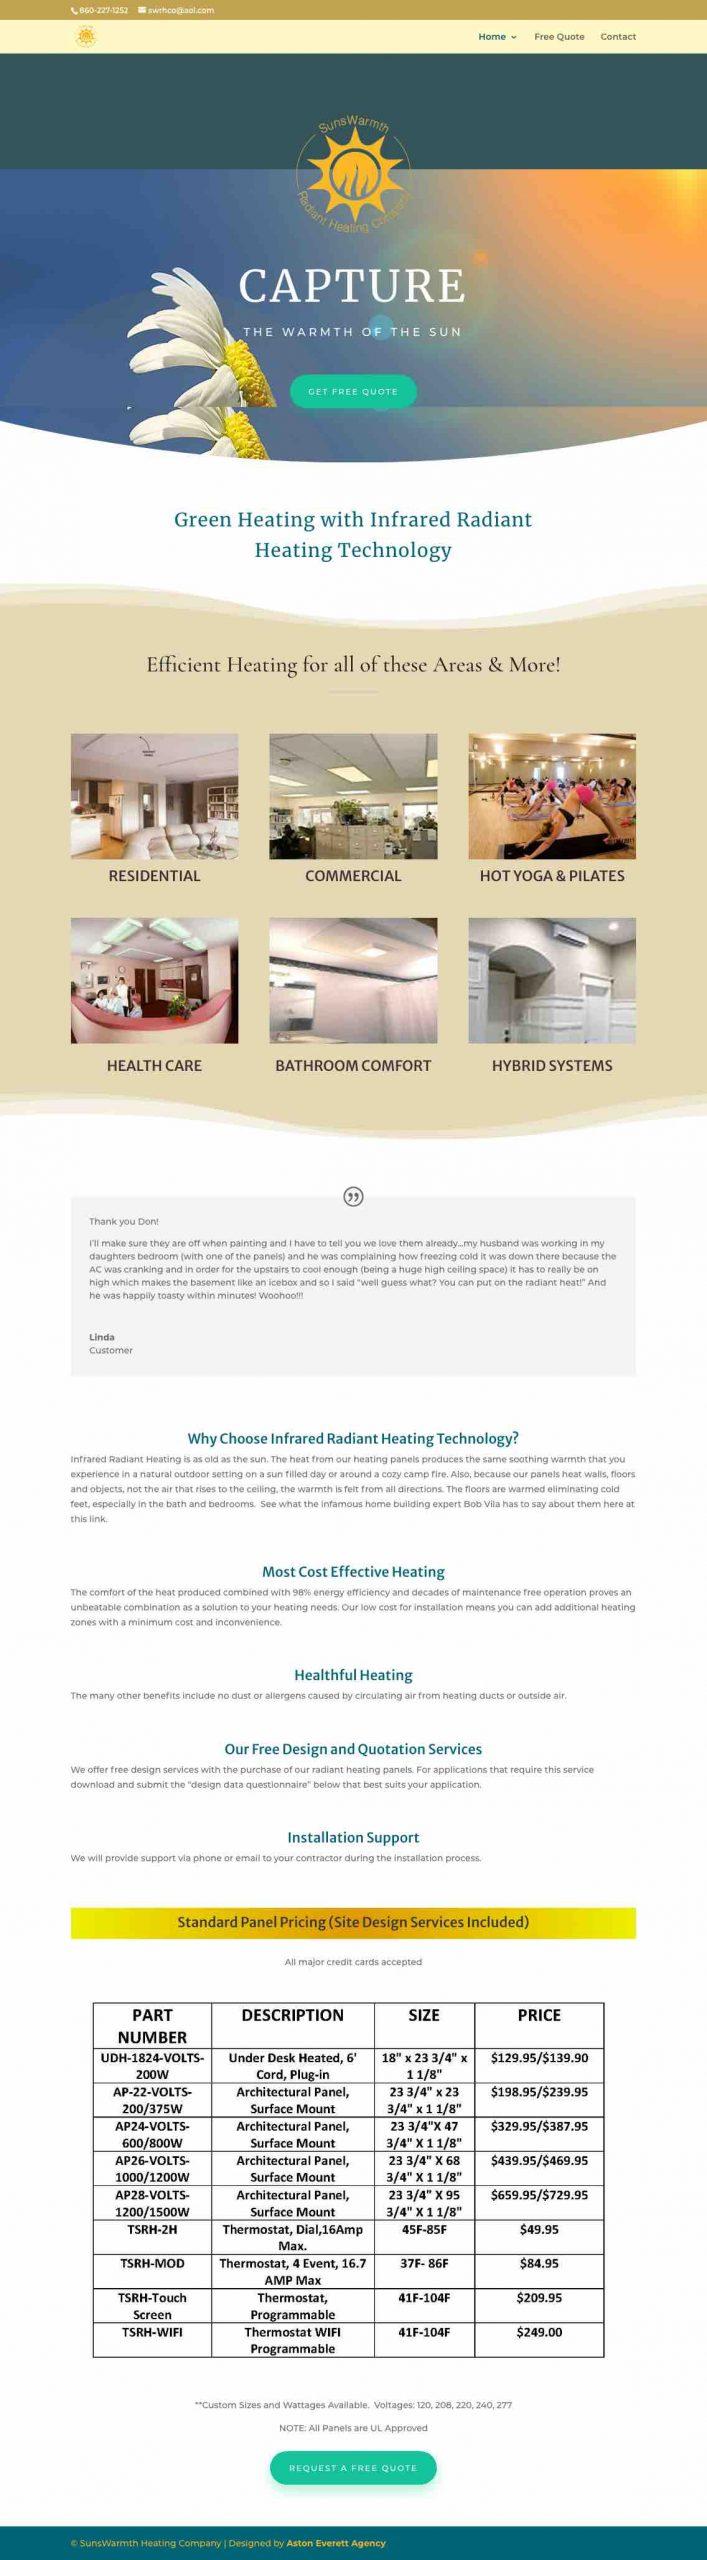 SunsWarmth - irradiantheat.com